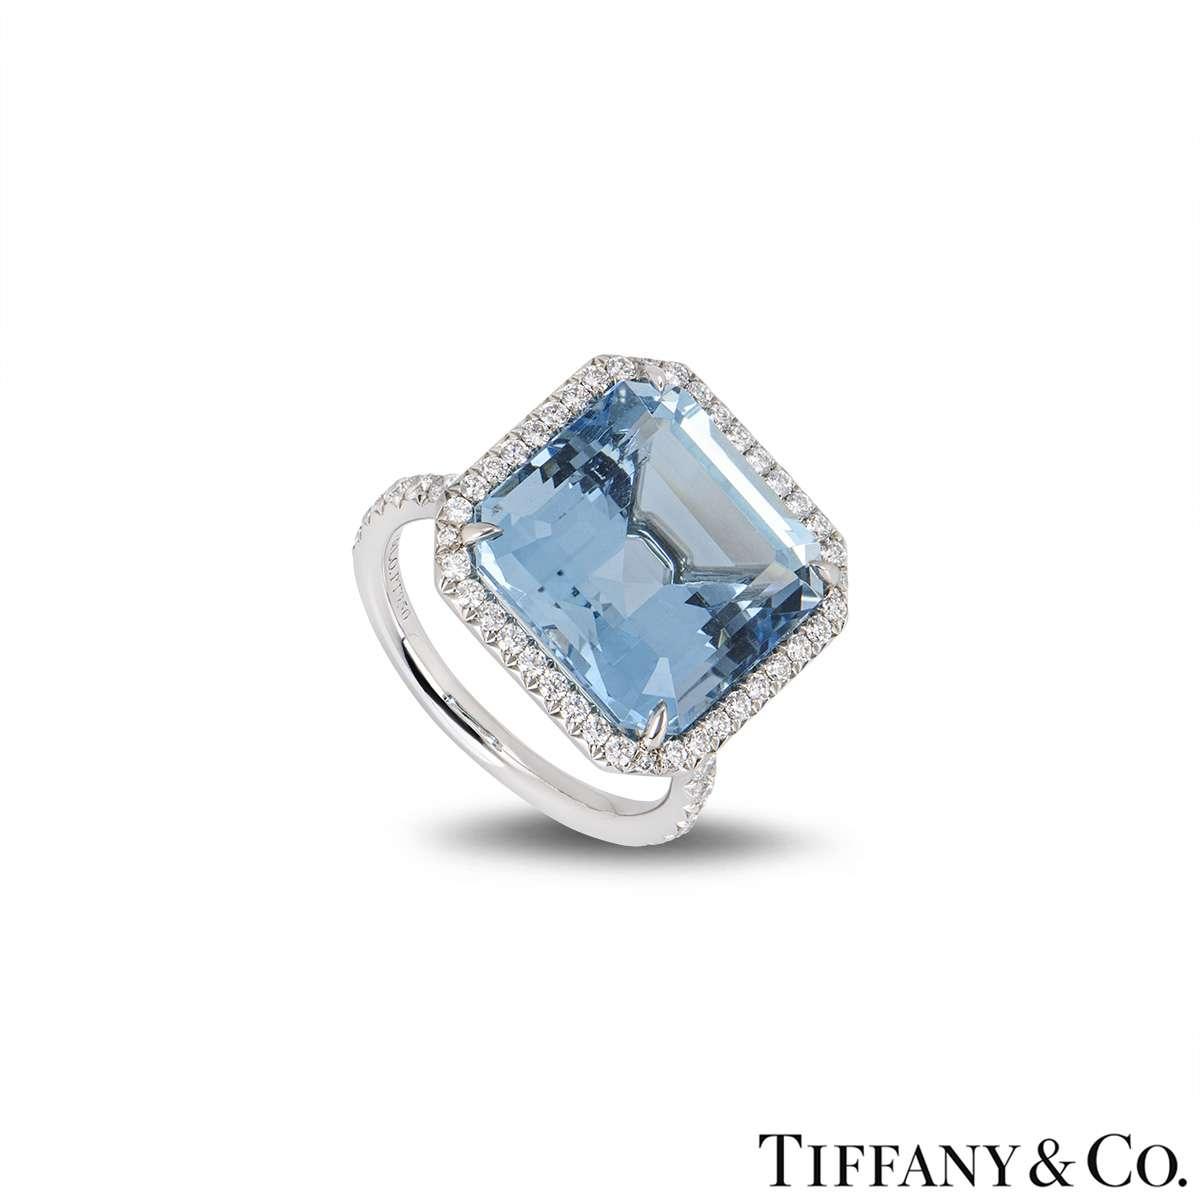 Tiffany & Co. Aquamarine and Diamond Platinum Ring